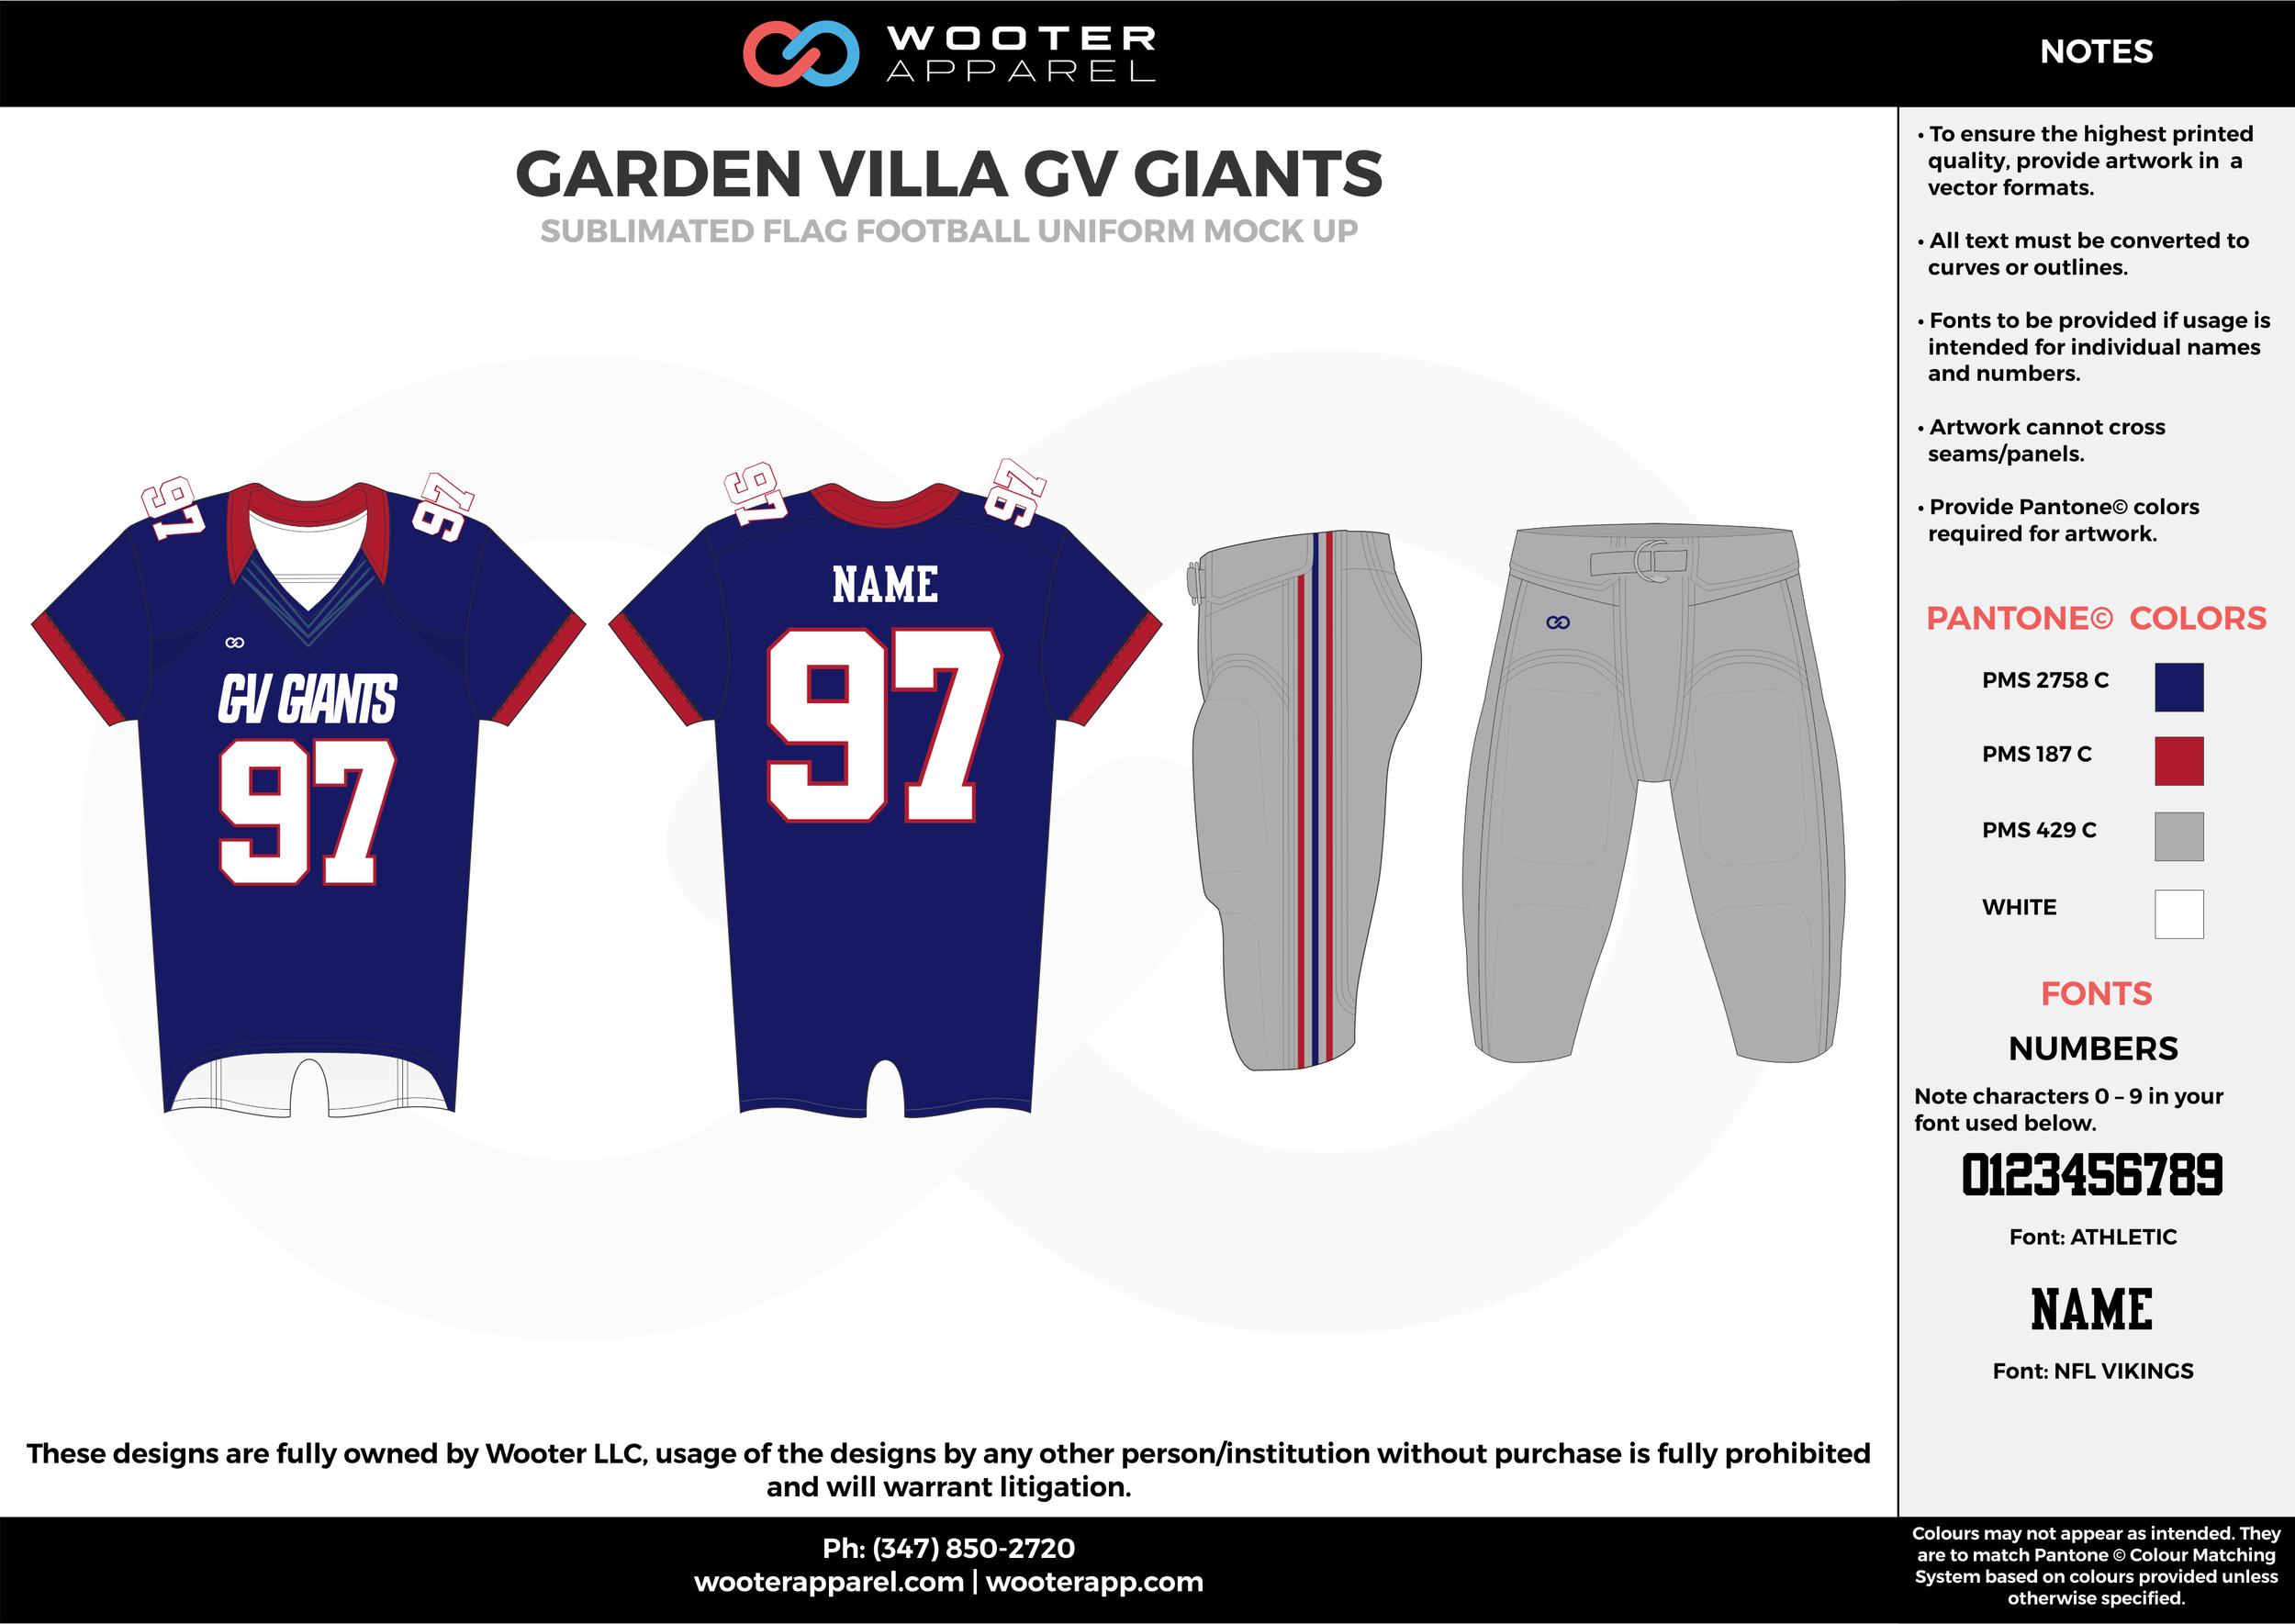 GARDEN VILLA GV GIANTS blue gray red white flag football uniforms jerseys pants